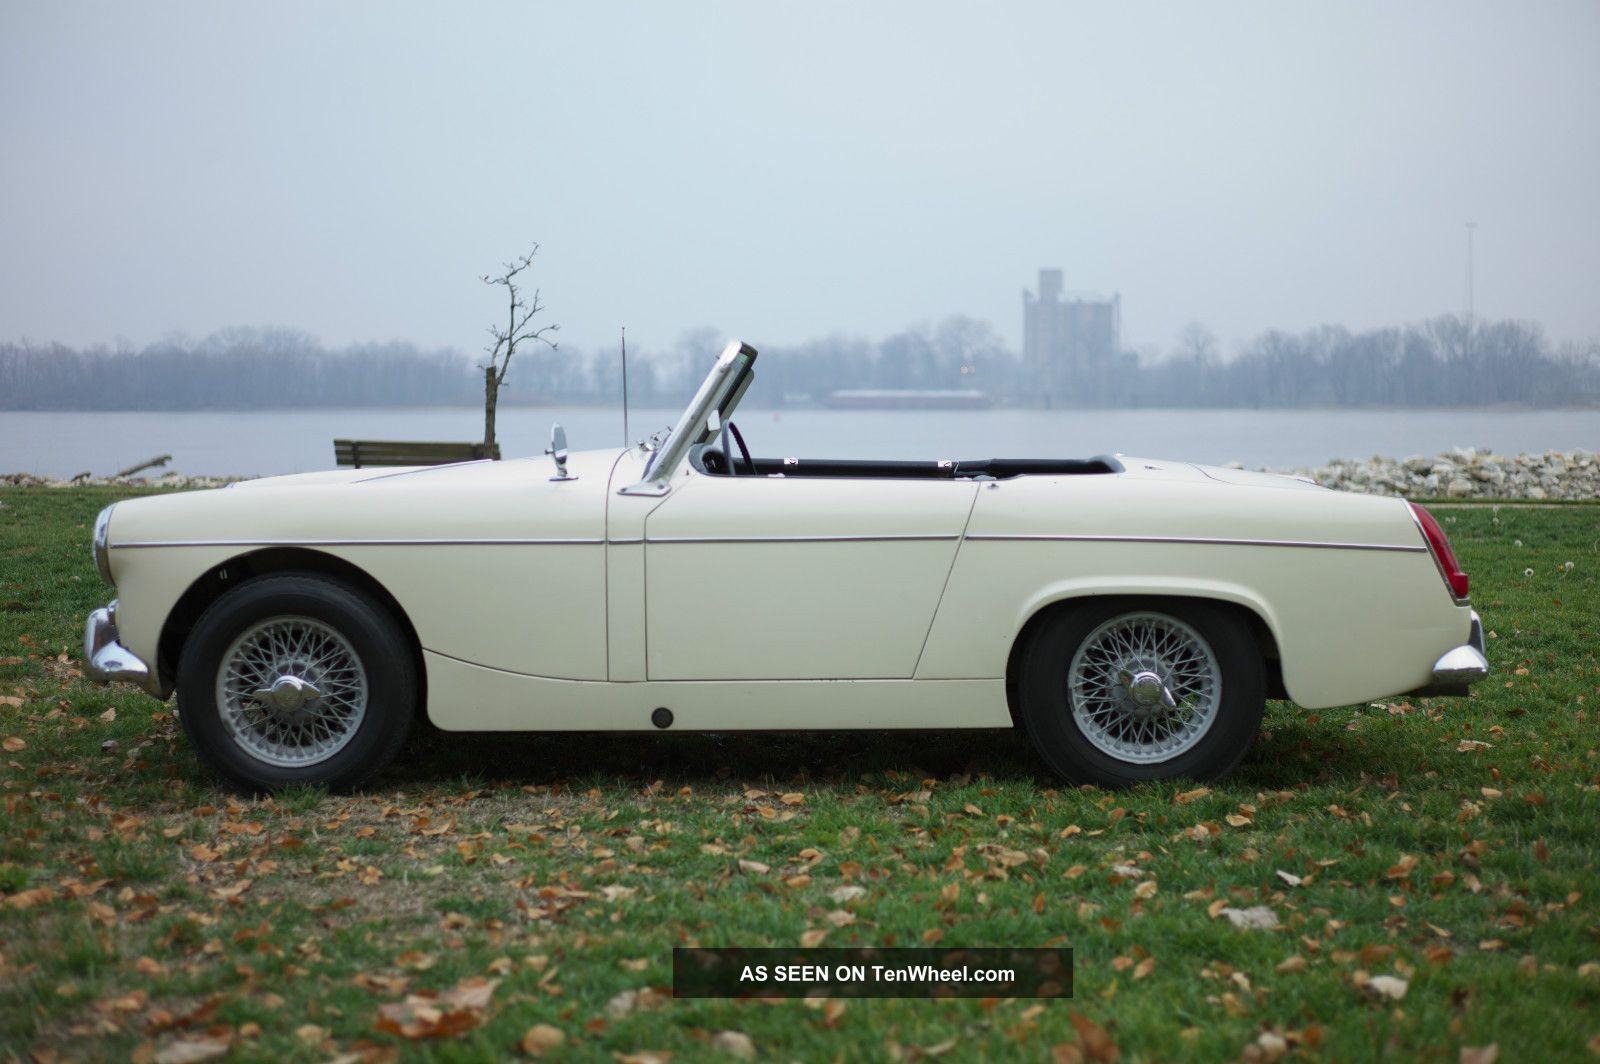 1963 Mki Mg Midget Excellent Rare Condition